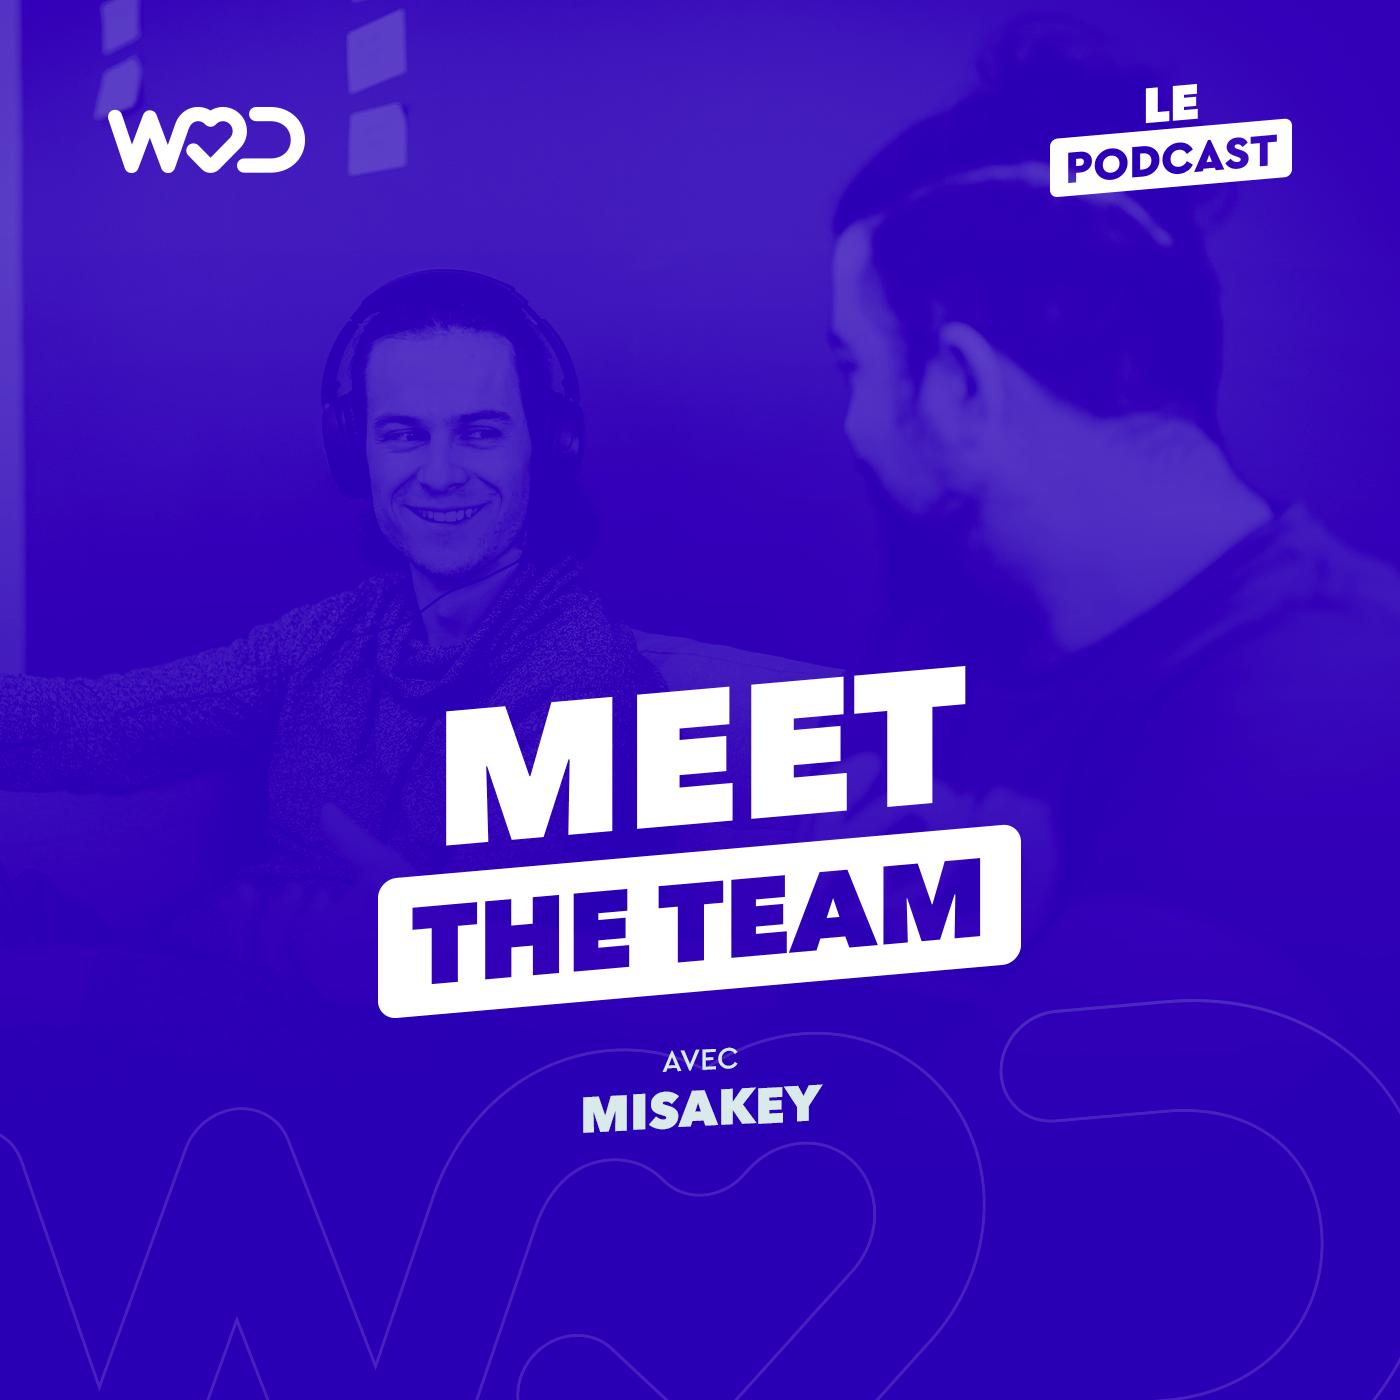 Le Podcast- Misakey